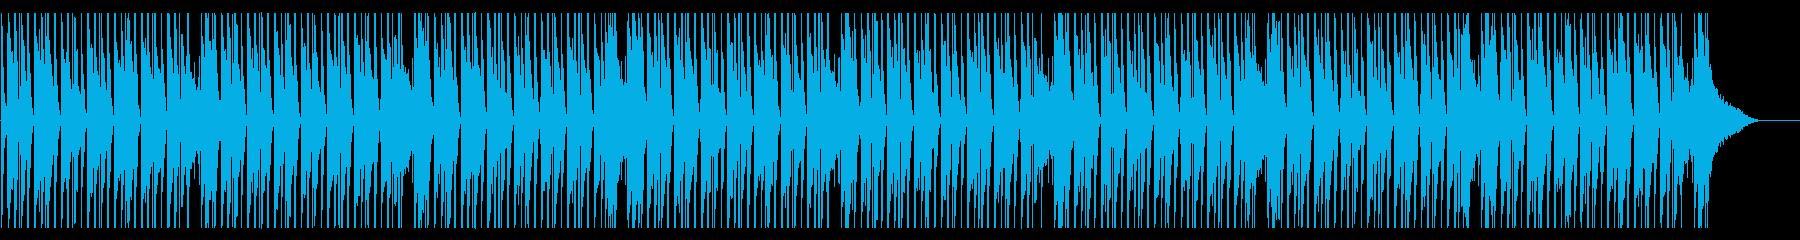 CMやアニメ系の日常の再生済みの波形